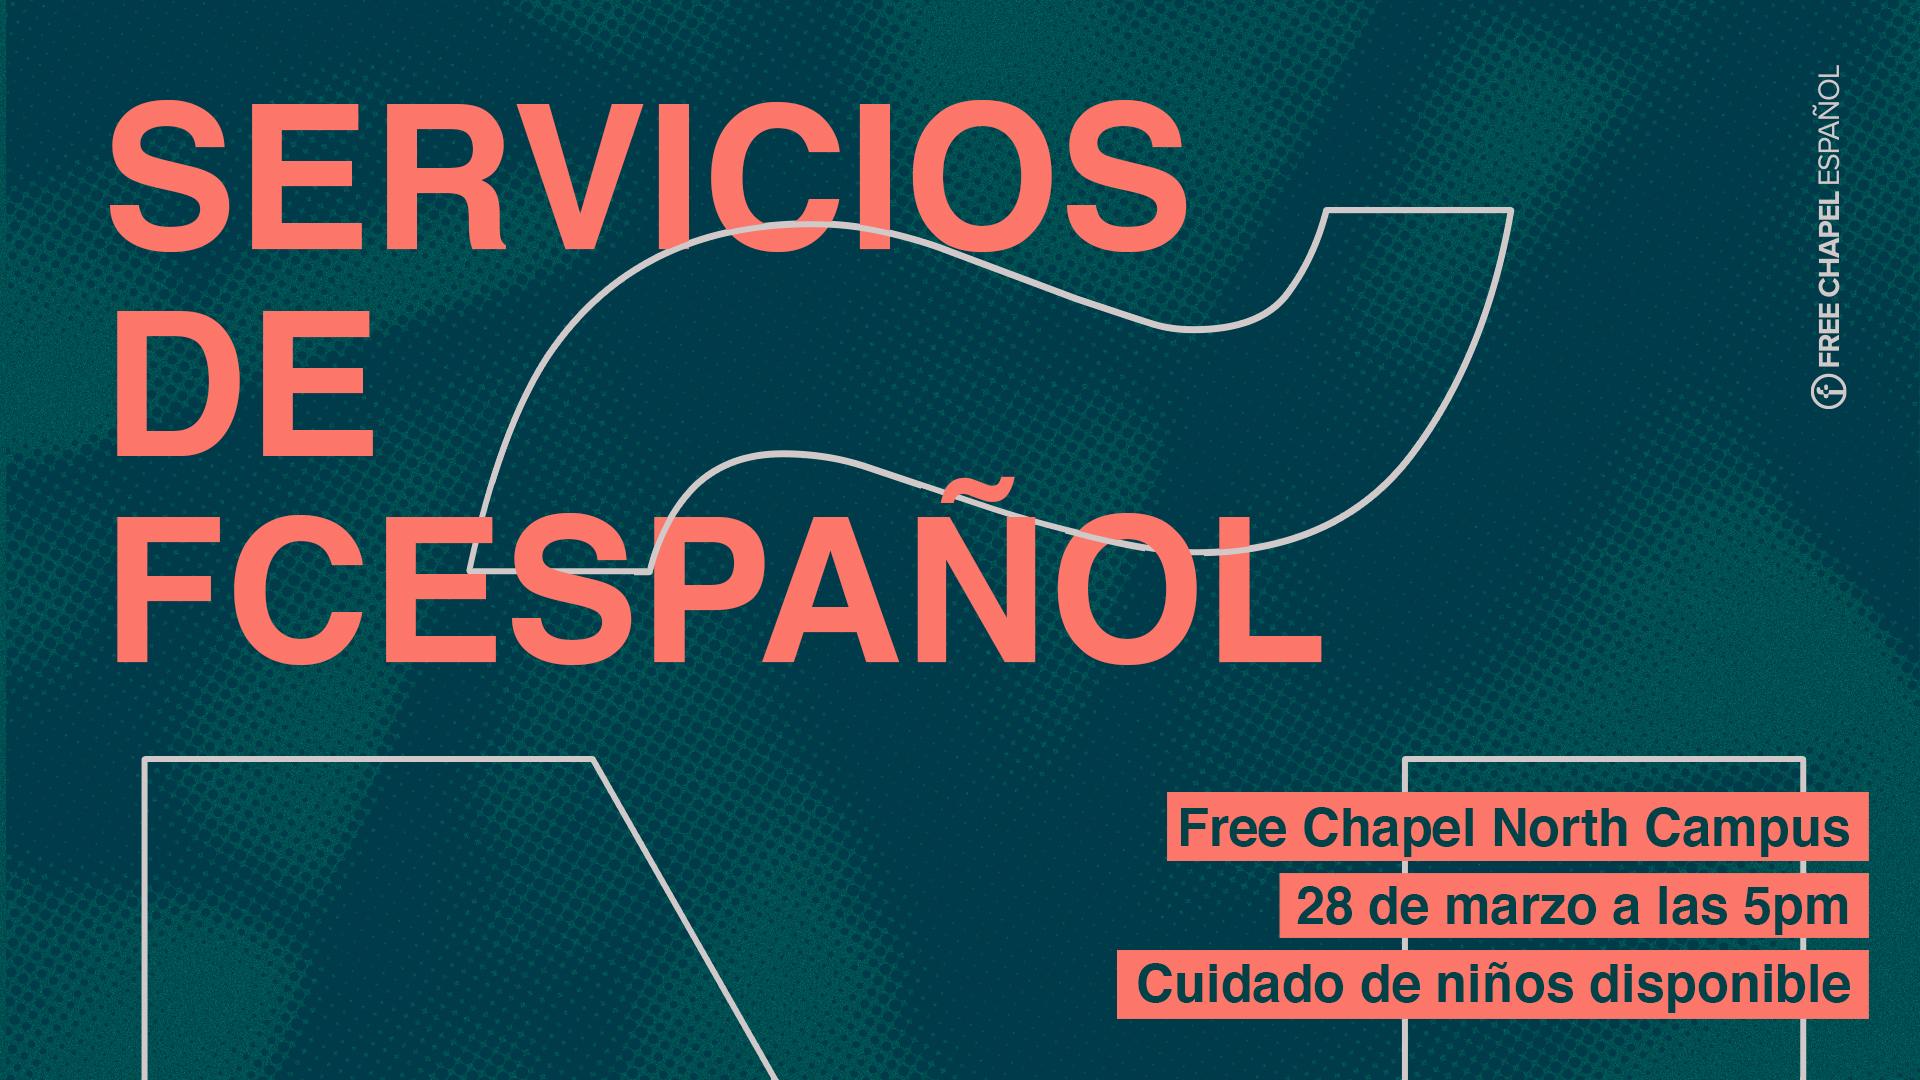 Servicios De FCEspañol at the Cumming campus